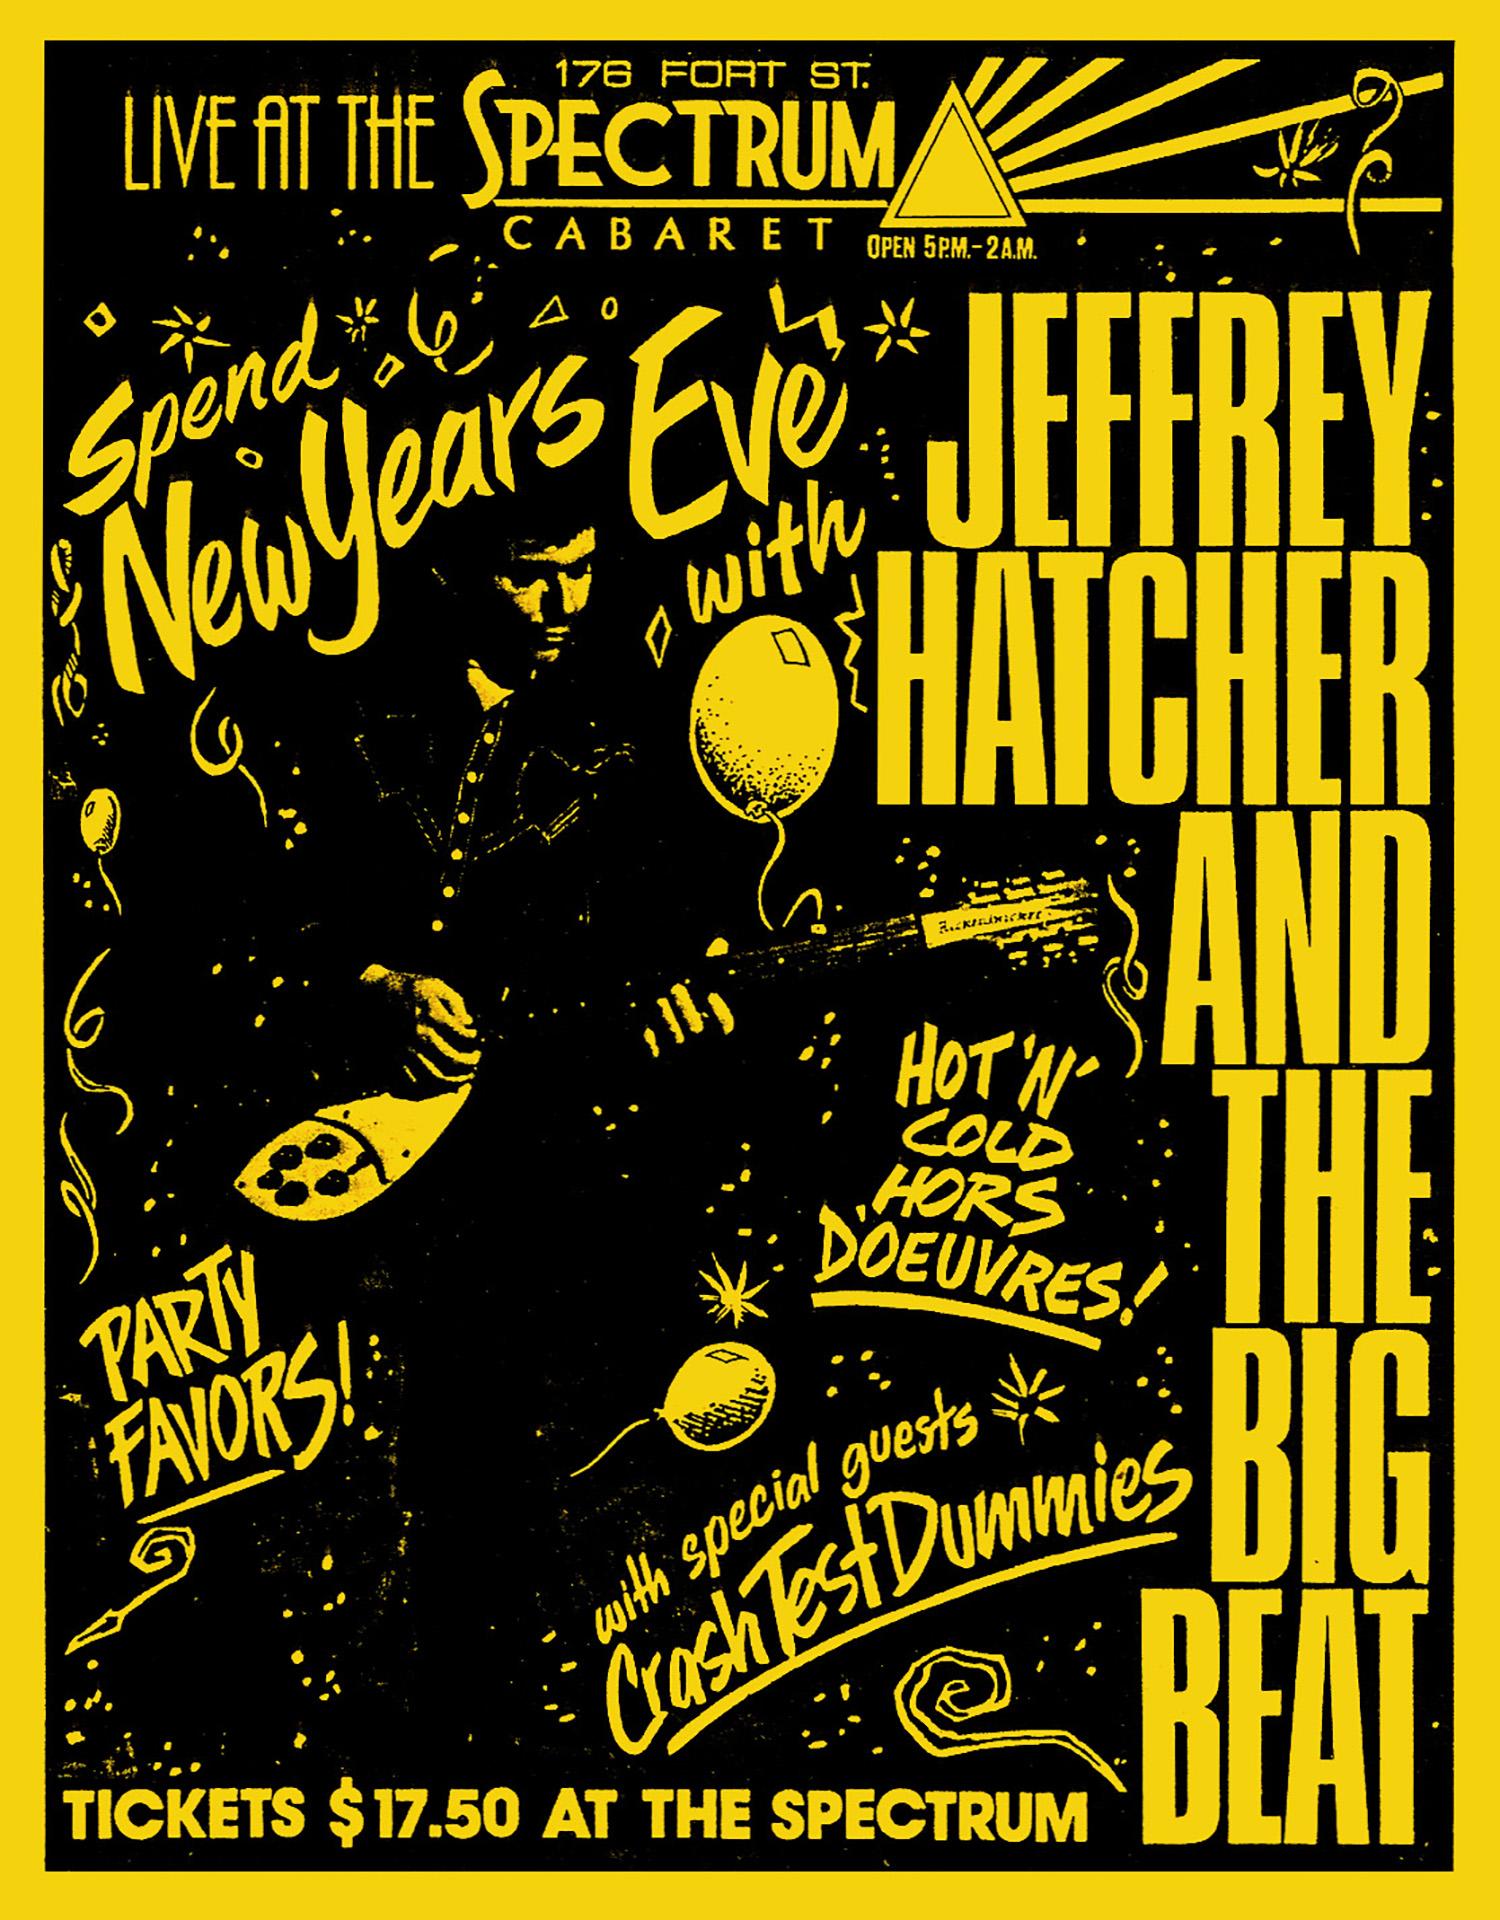 Jeffrey Hatcher and the Big Beat - 1990